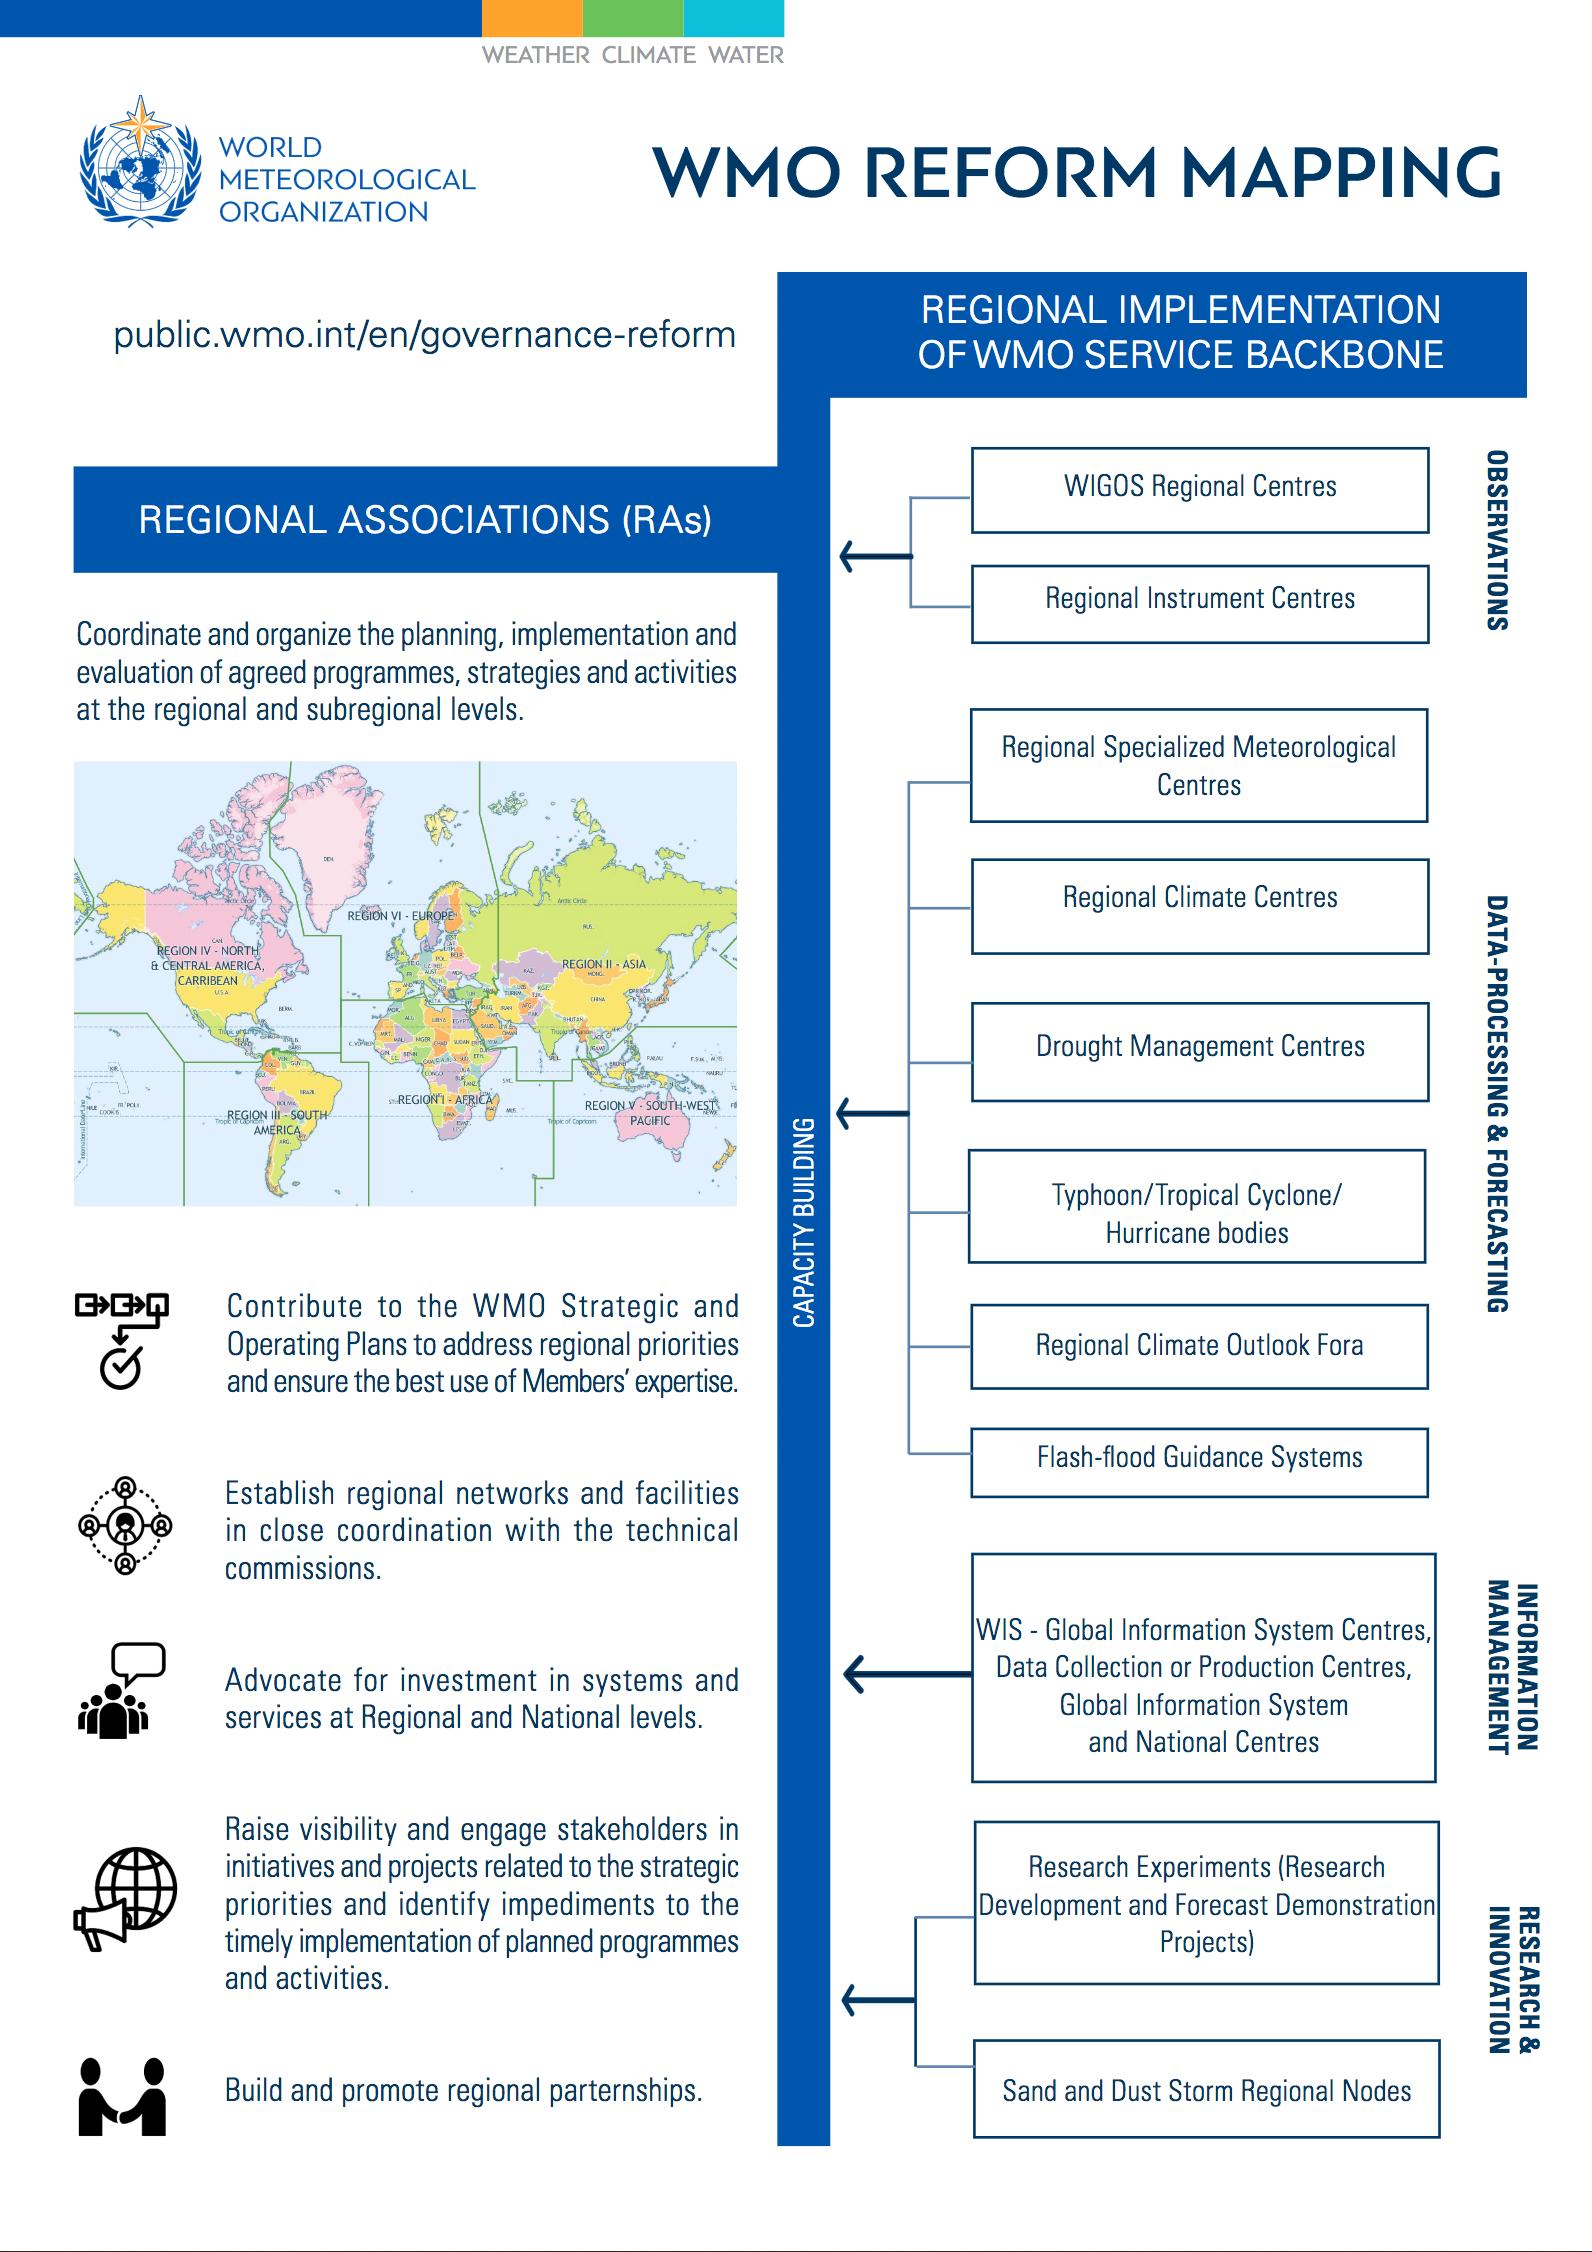 WMO Reform Mapping: Regional Associations